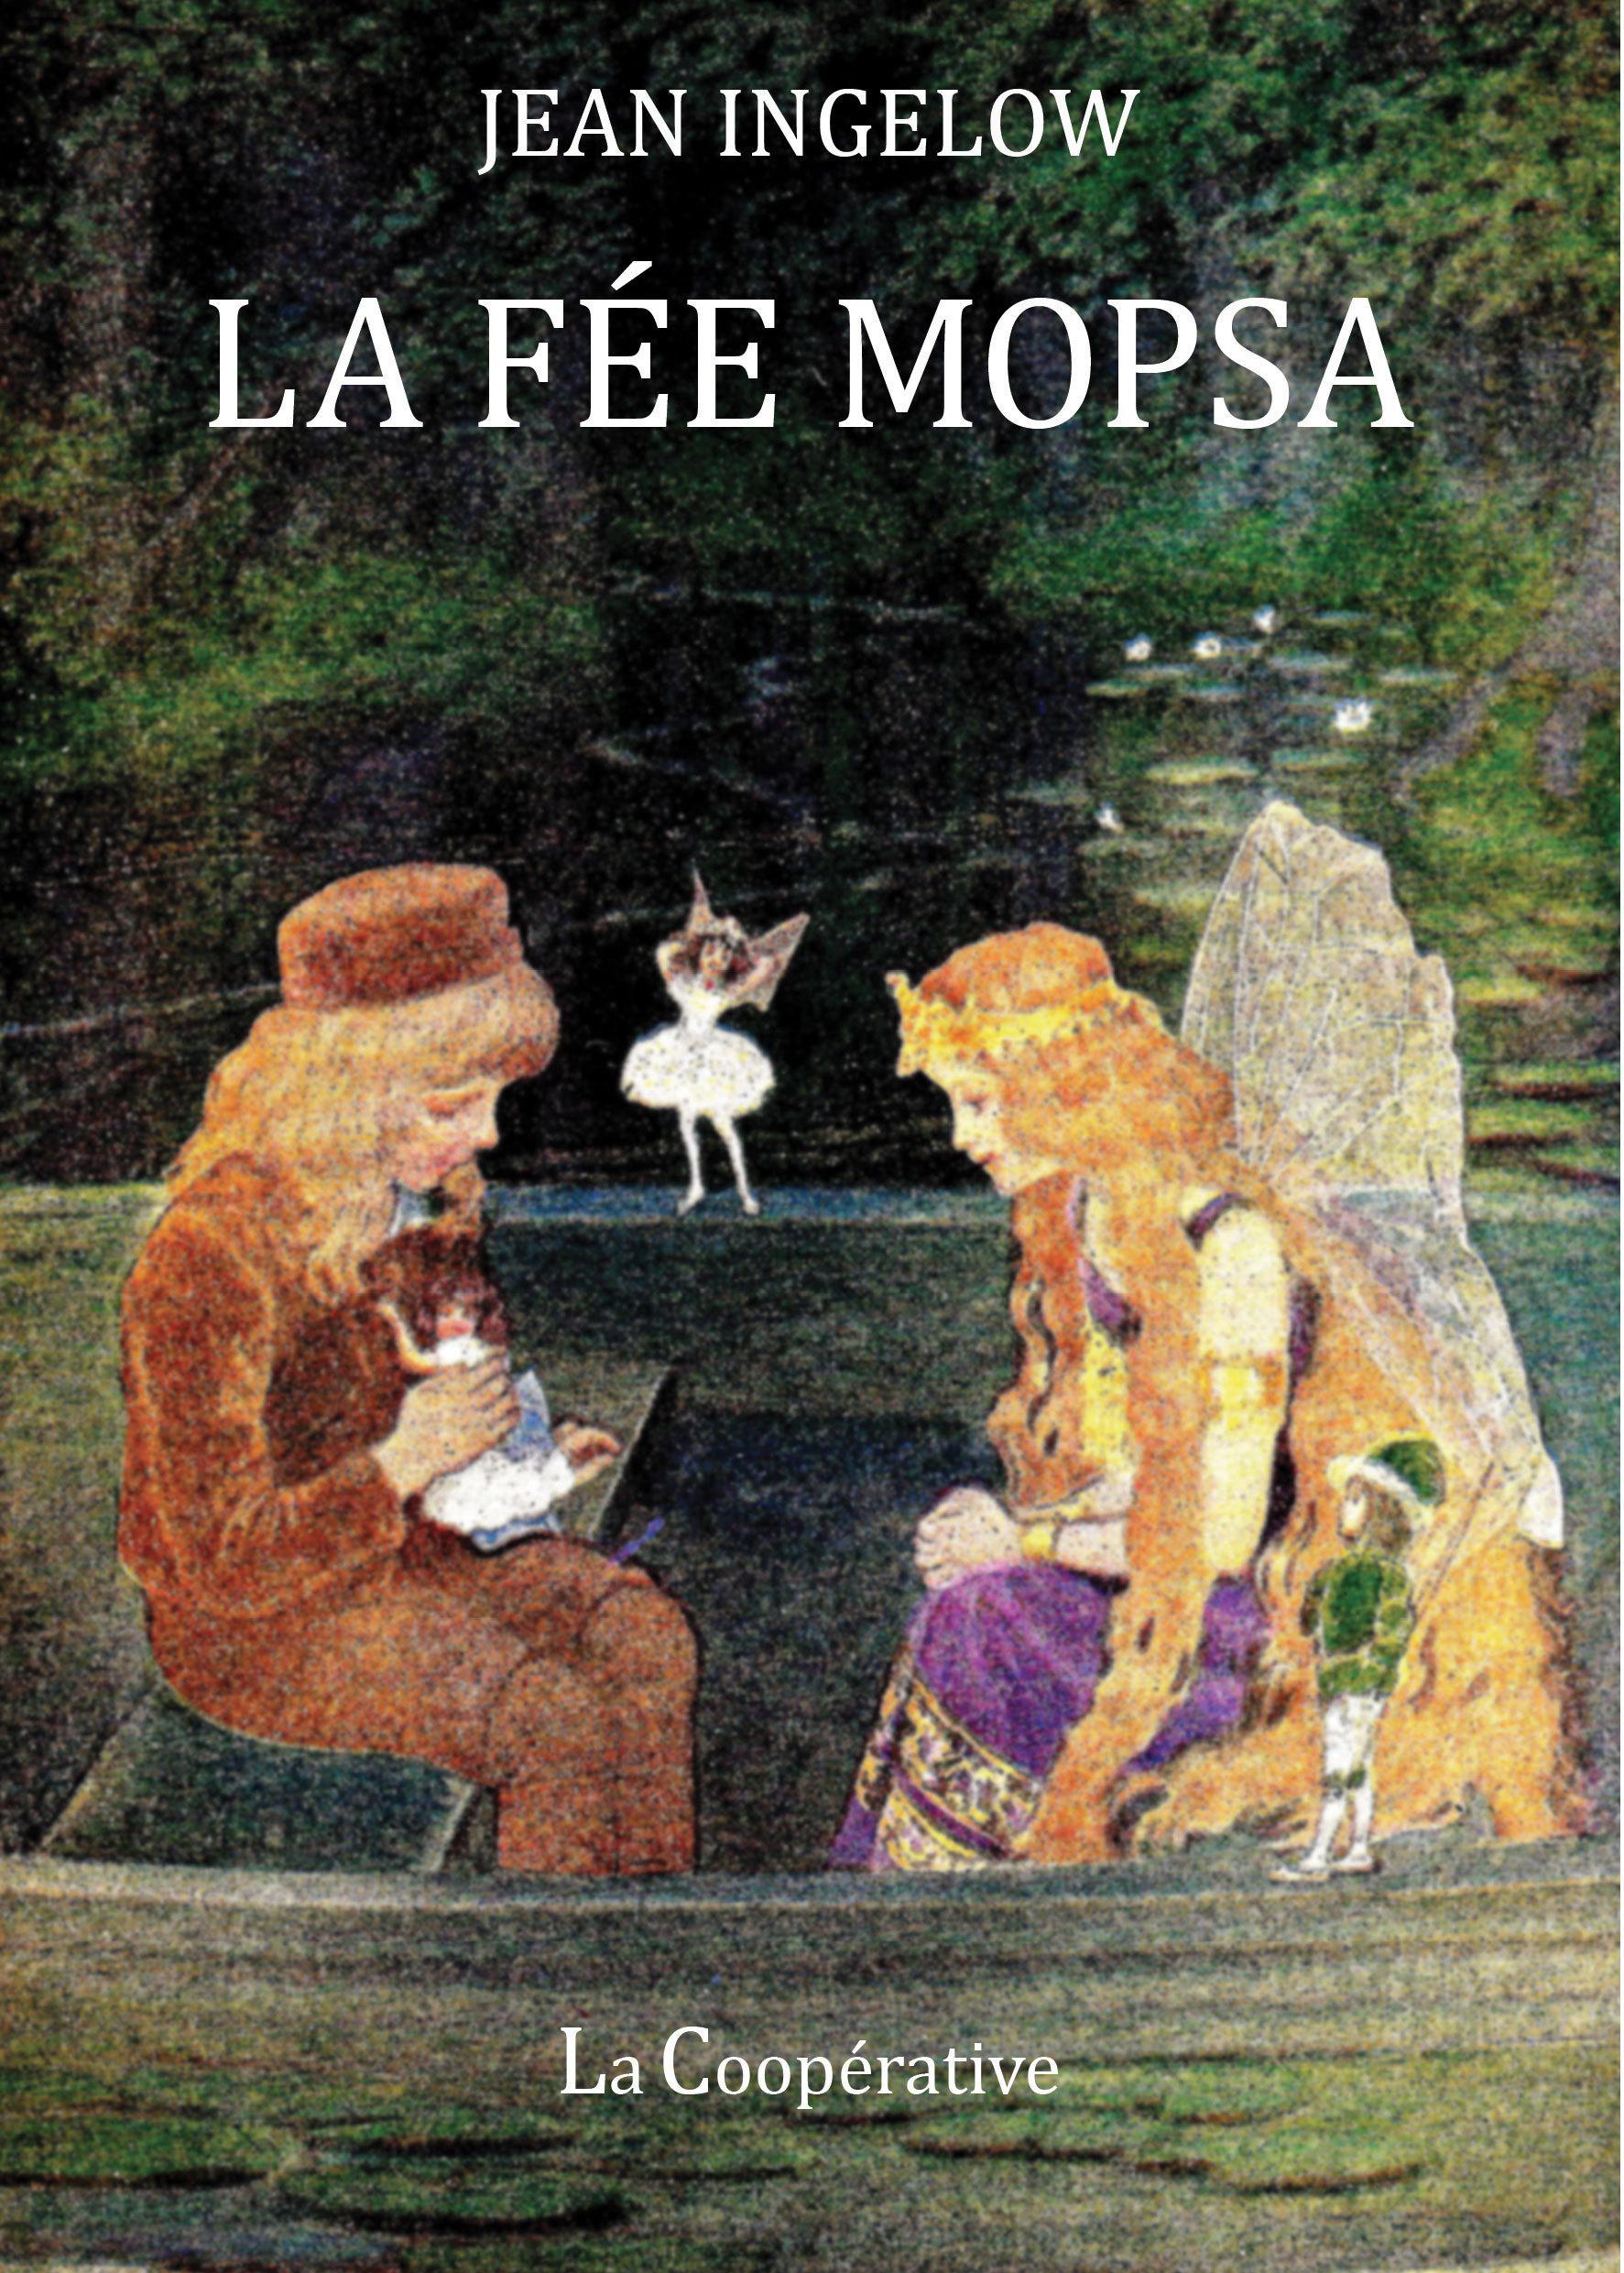 FEE MOPSA (LA)